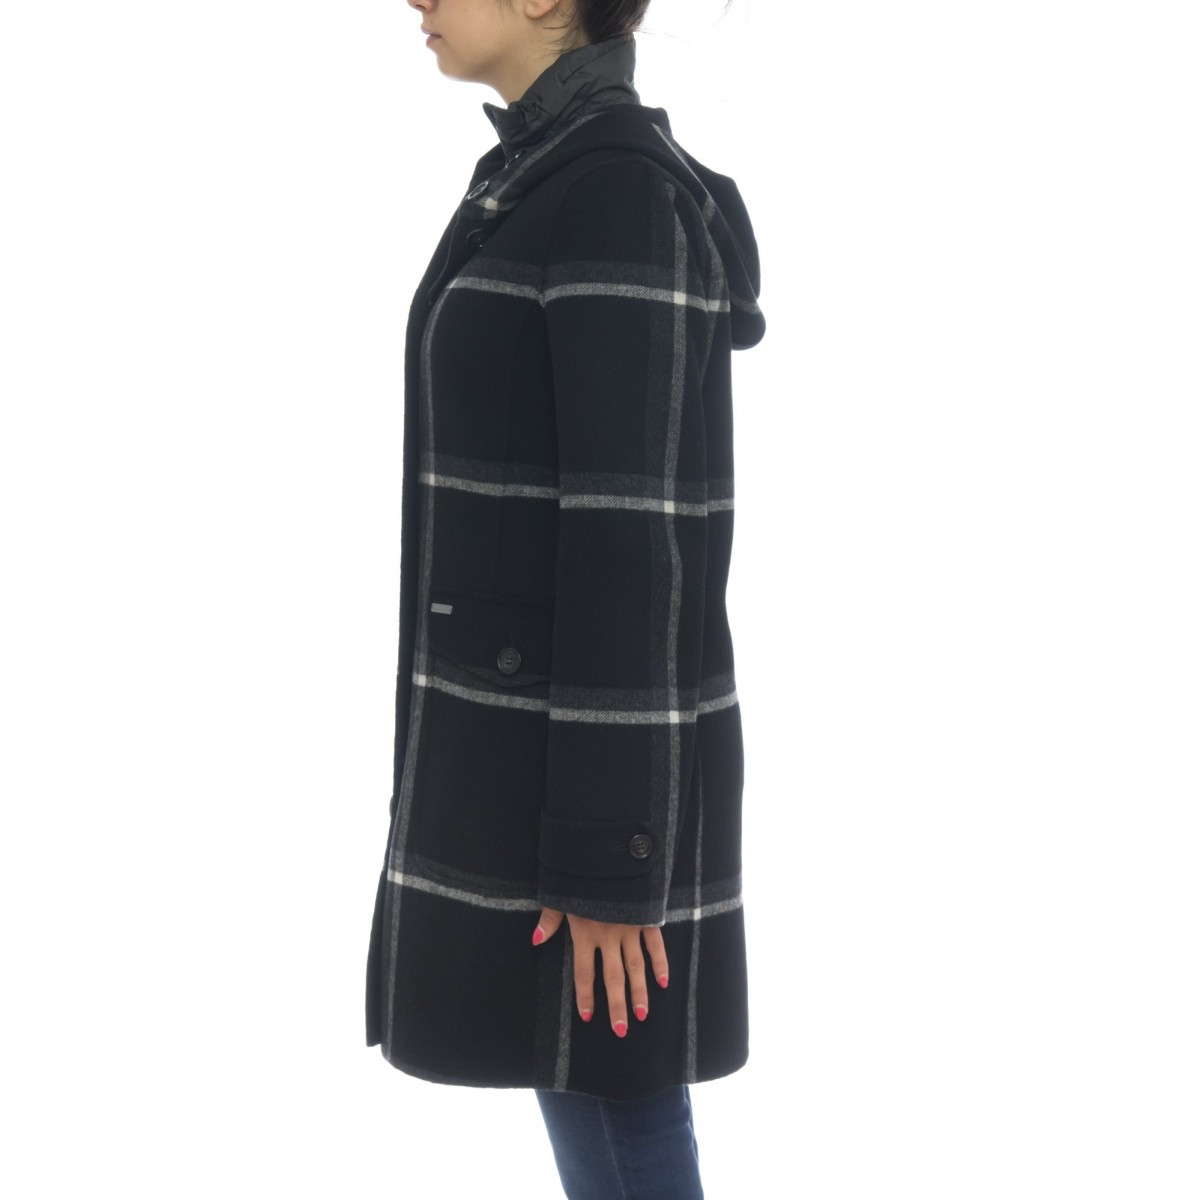 Piumino - Wwcps2618 df06 cappotto marcy coat